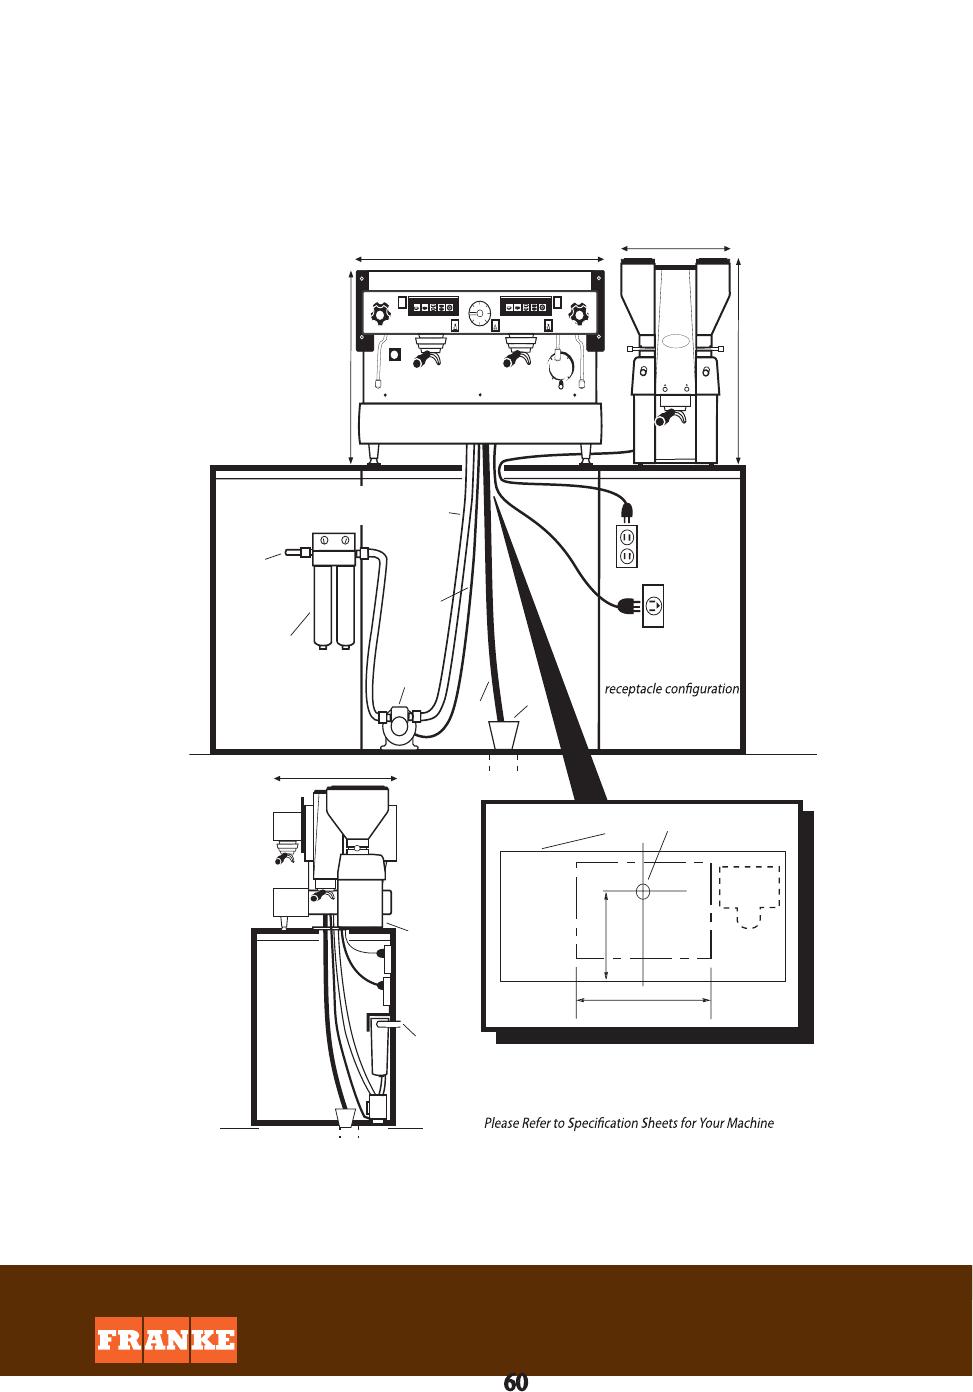 Sony Cdx Gt520 Wiring Diagram Deck